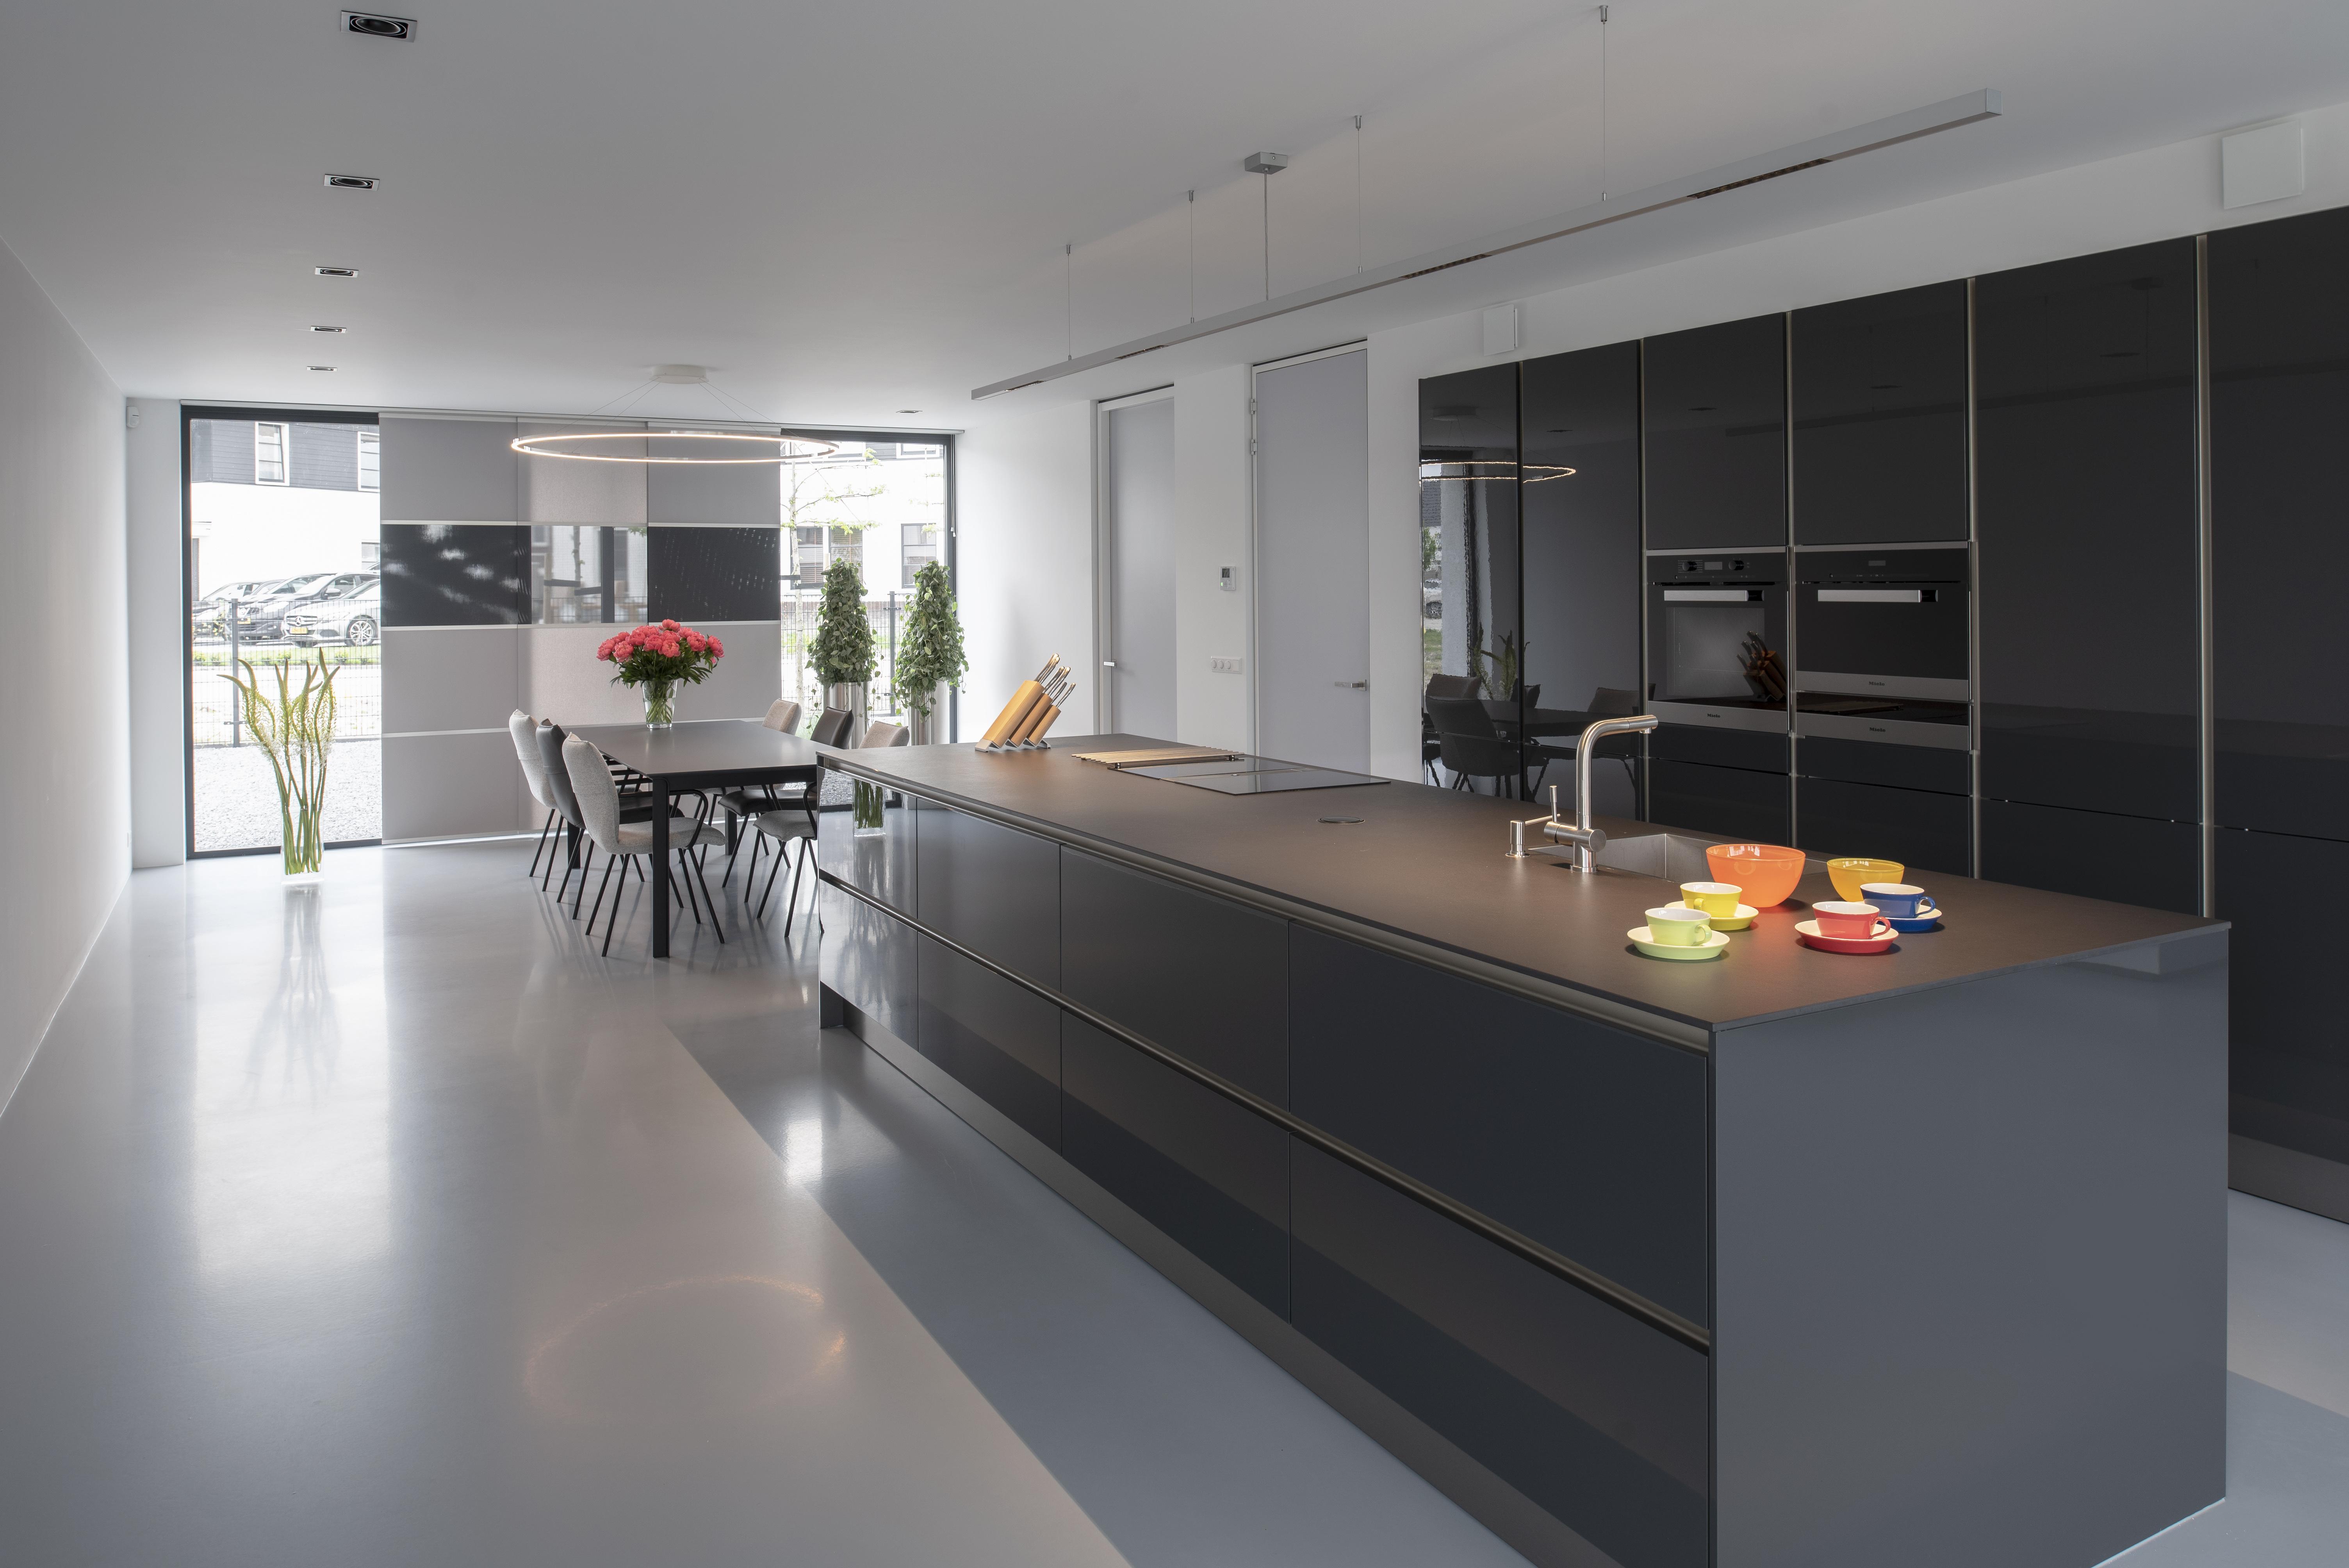 <p>Keuken en eetkamer.</p>